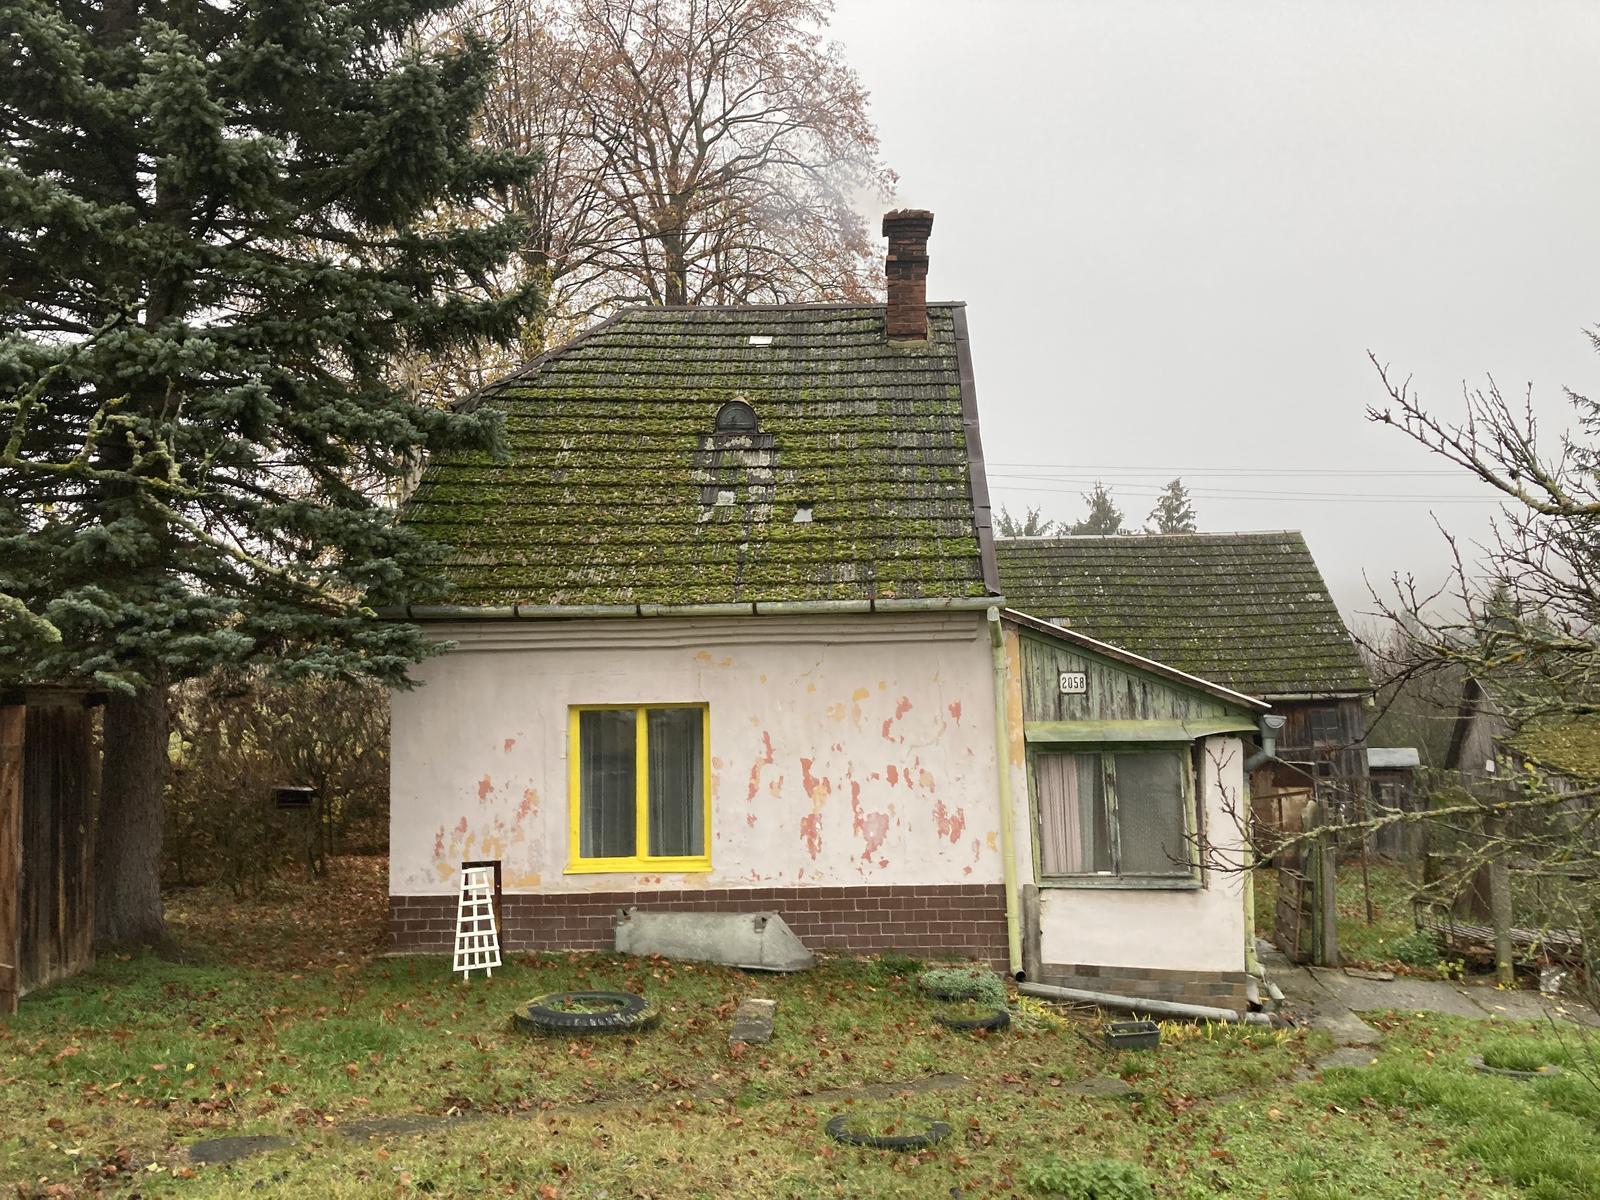 Dom - tento rok sa nakoniec strecha nestihla, uloha ostava na rok 2021